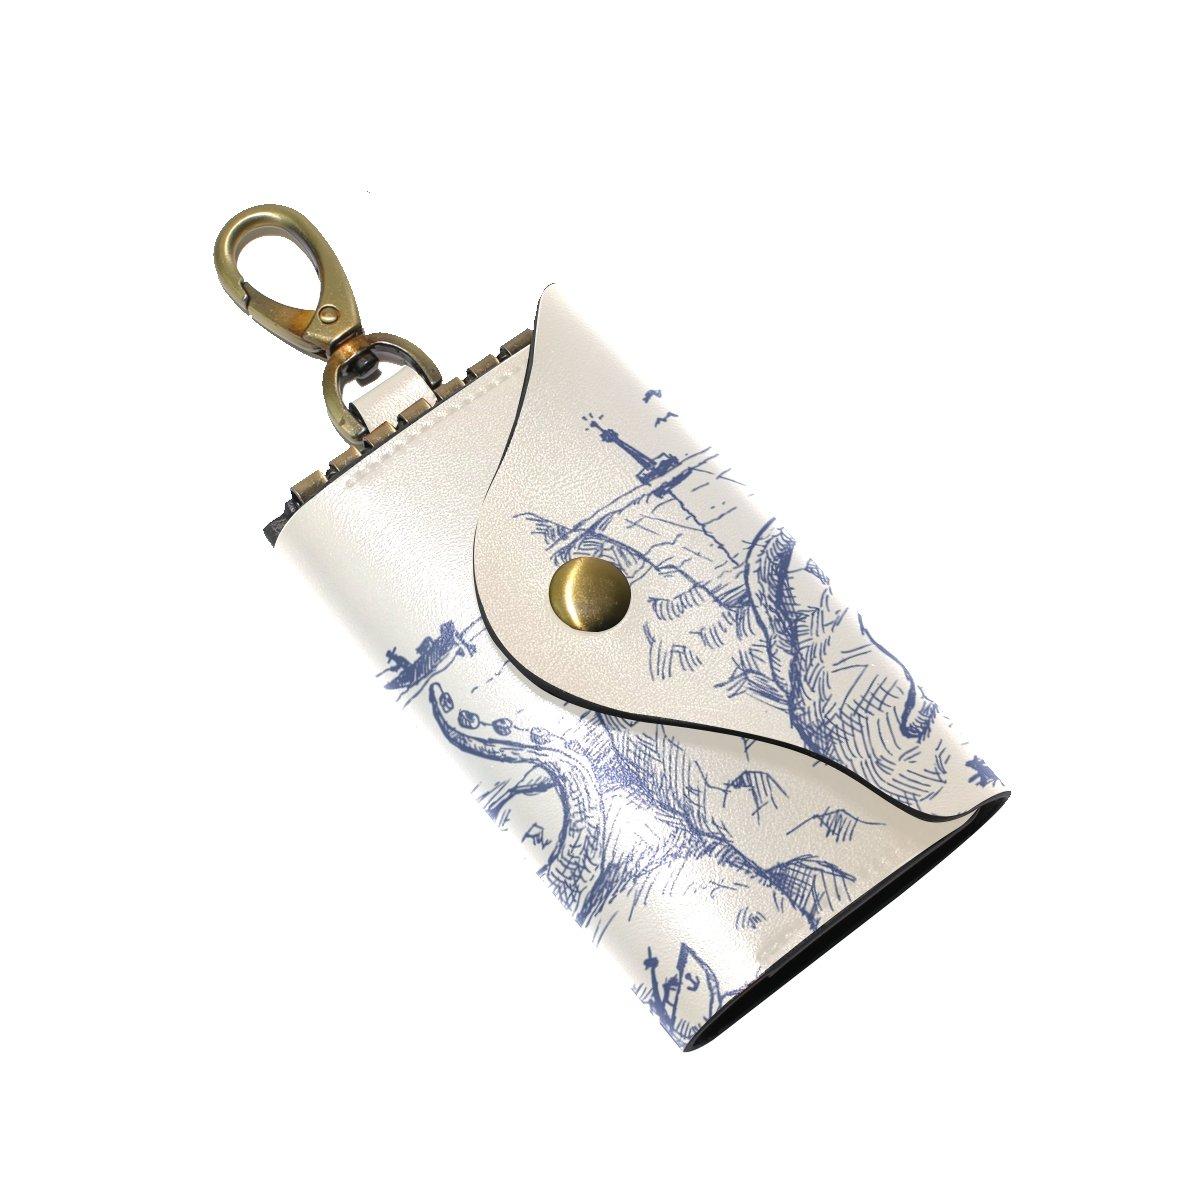 DEYYA Octopus Property Sea Deadly Leather Key Case Wallets Unisex Keychain Key Holder with 6 Hooks Snap Closure